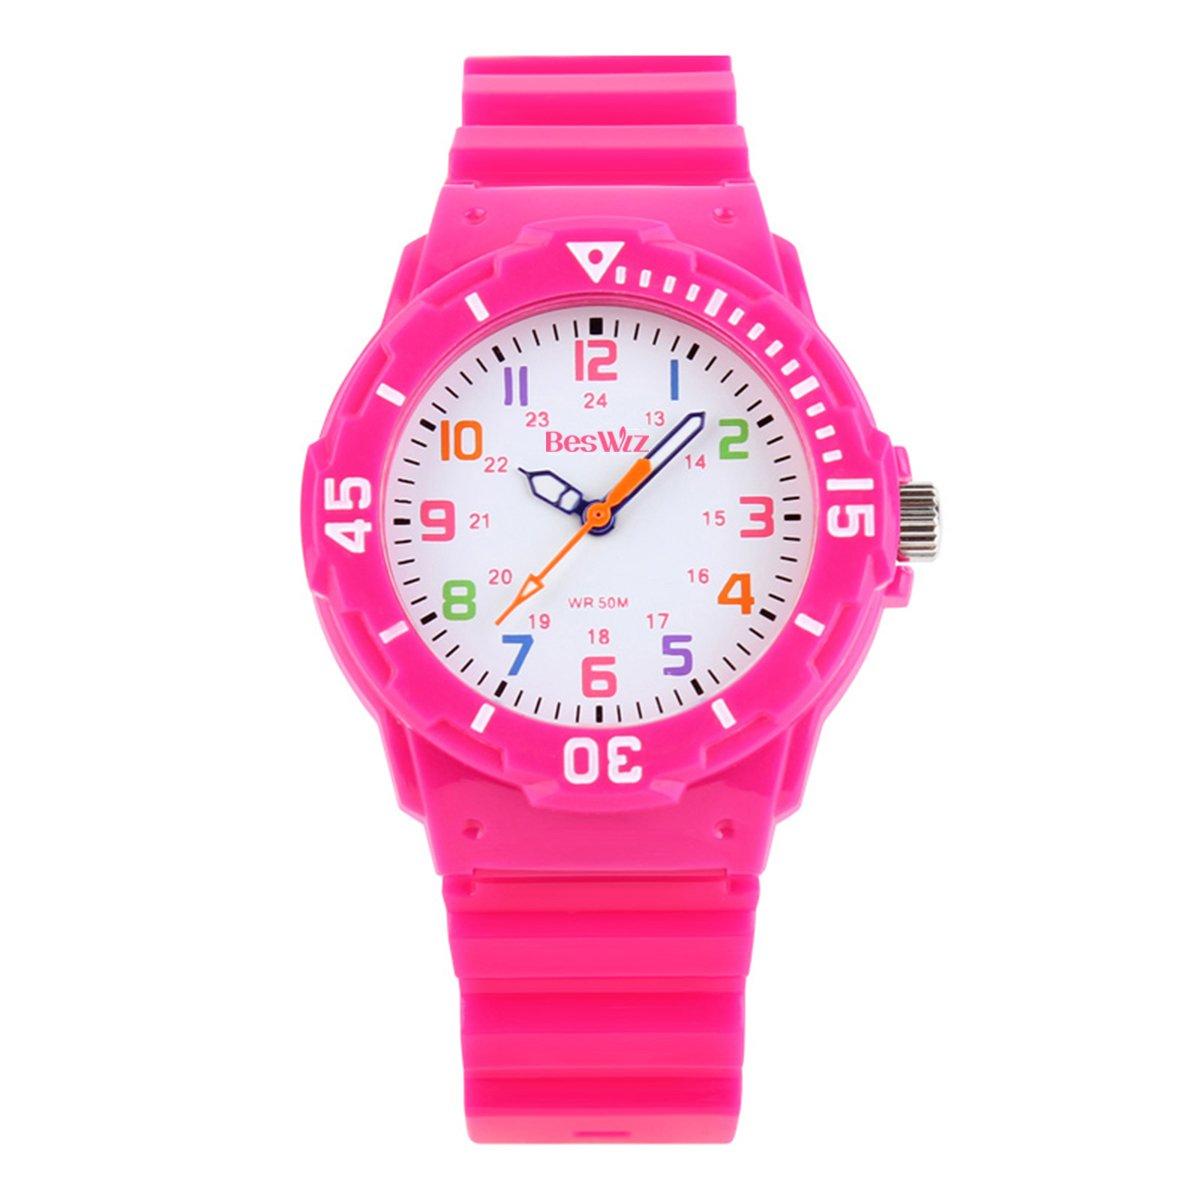 Kids Watches 50M Daily Waterproof Time Teacher Children Girly Boys Wrist Watch Pink